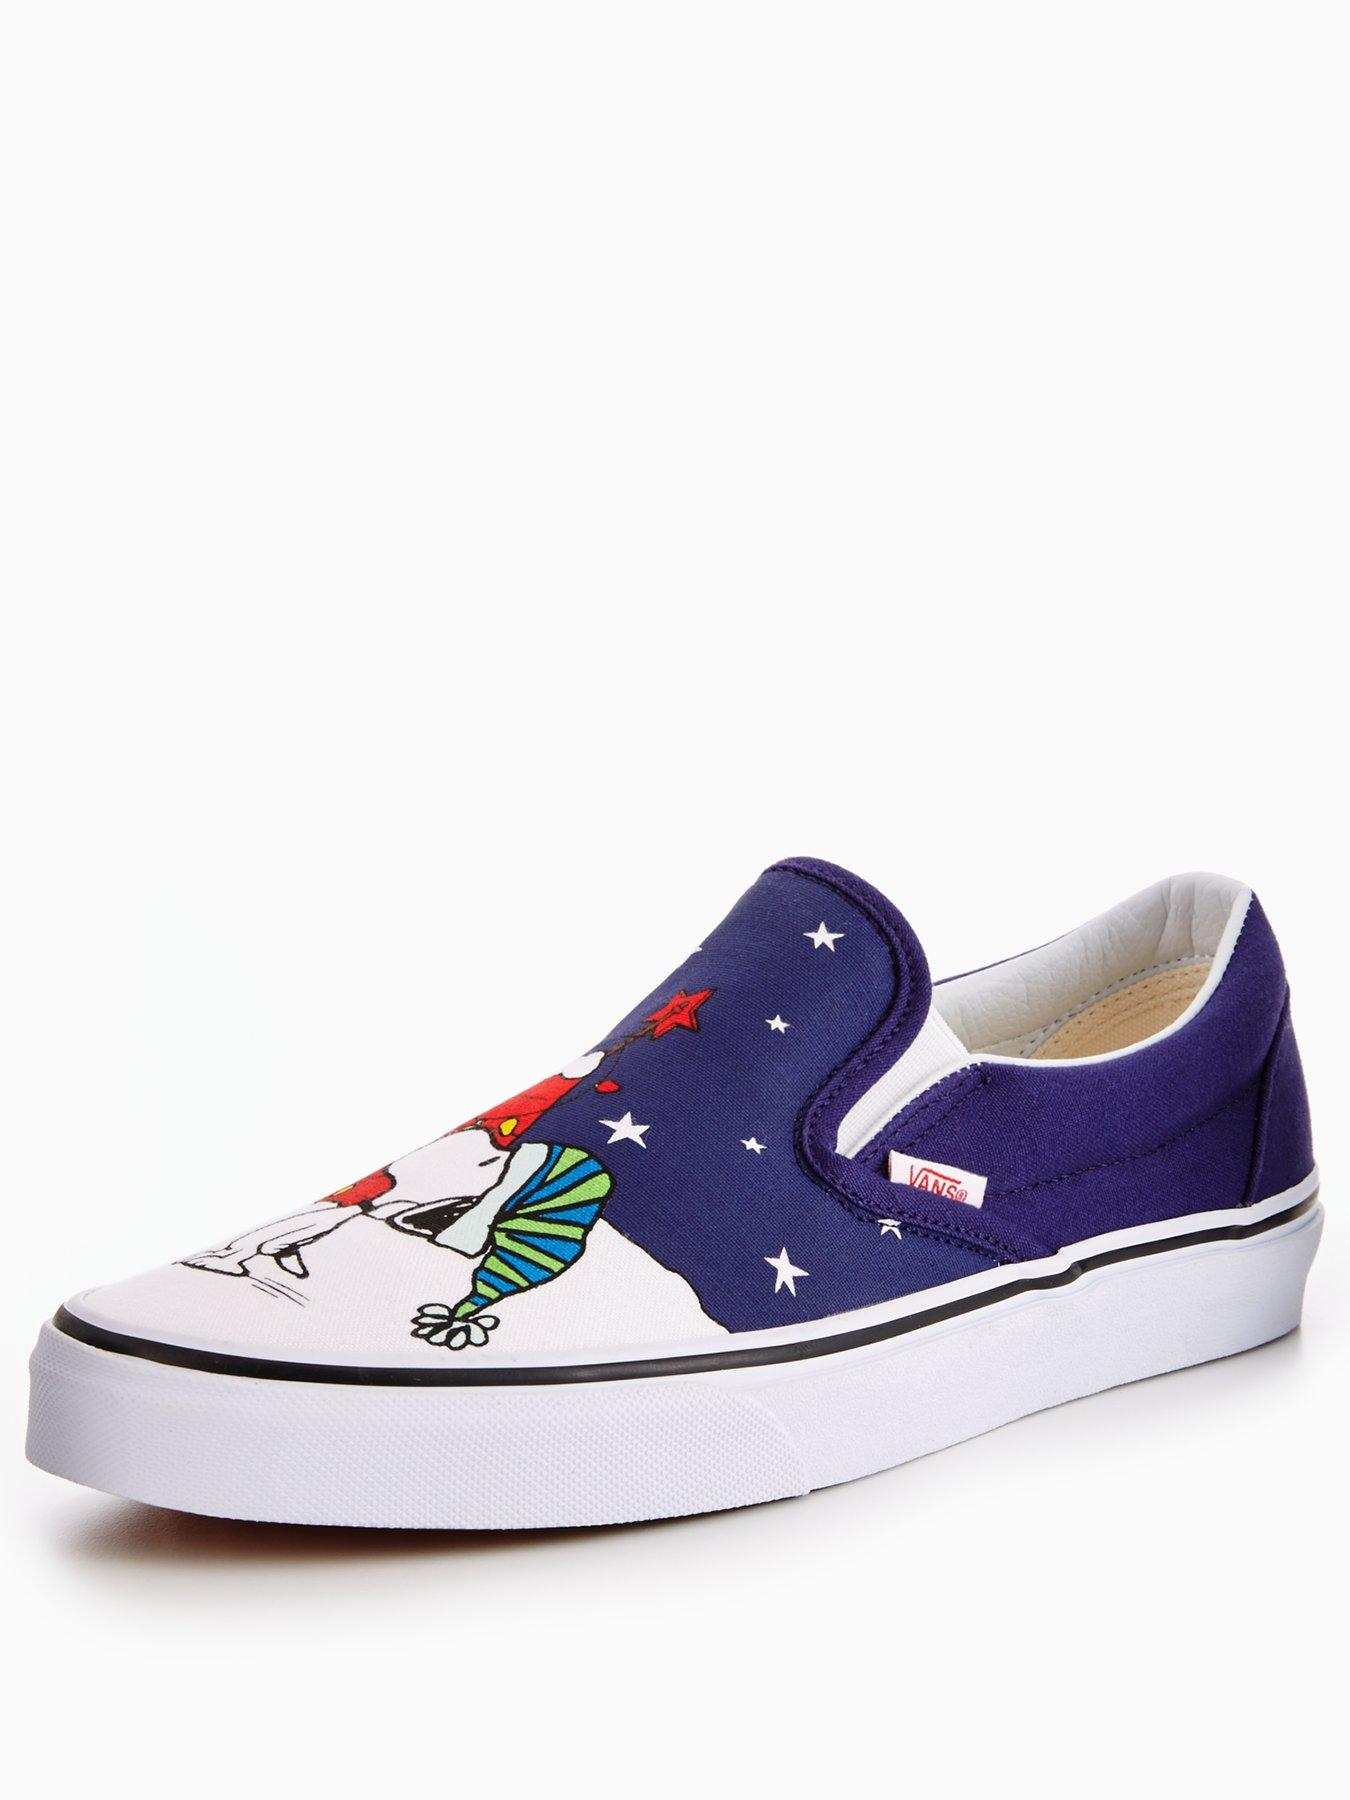 Vans Vans Peanuts Charlie Xmas Ua Classic Slip on 1600181870 Men's Shoes Vans Pumps Plimsolls